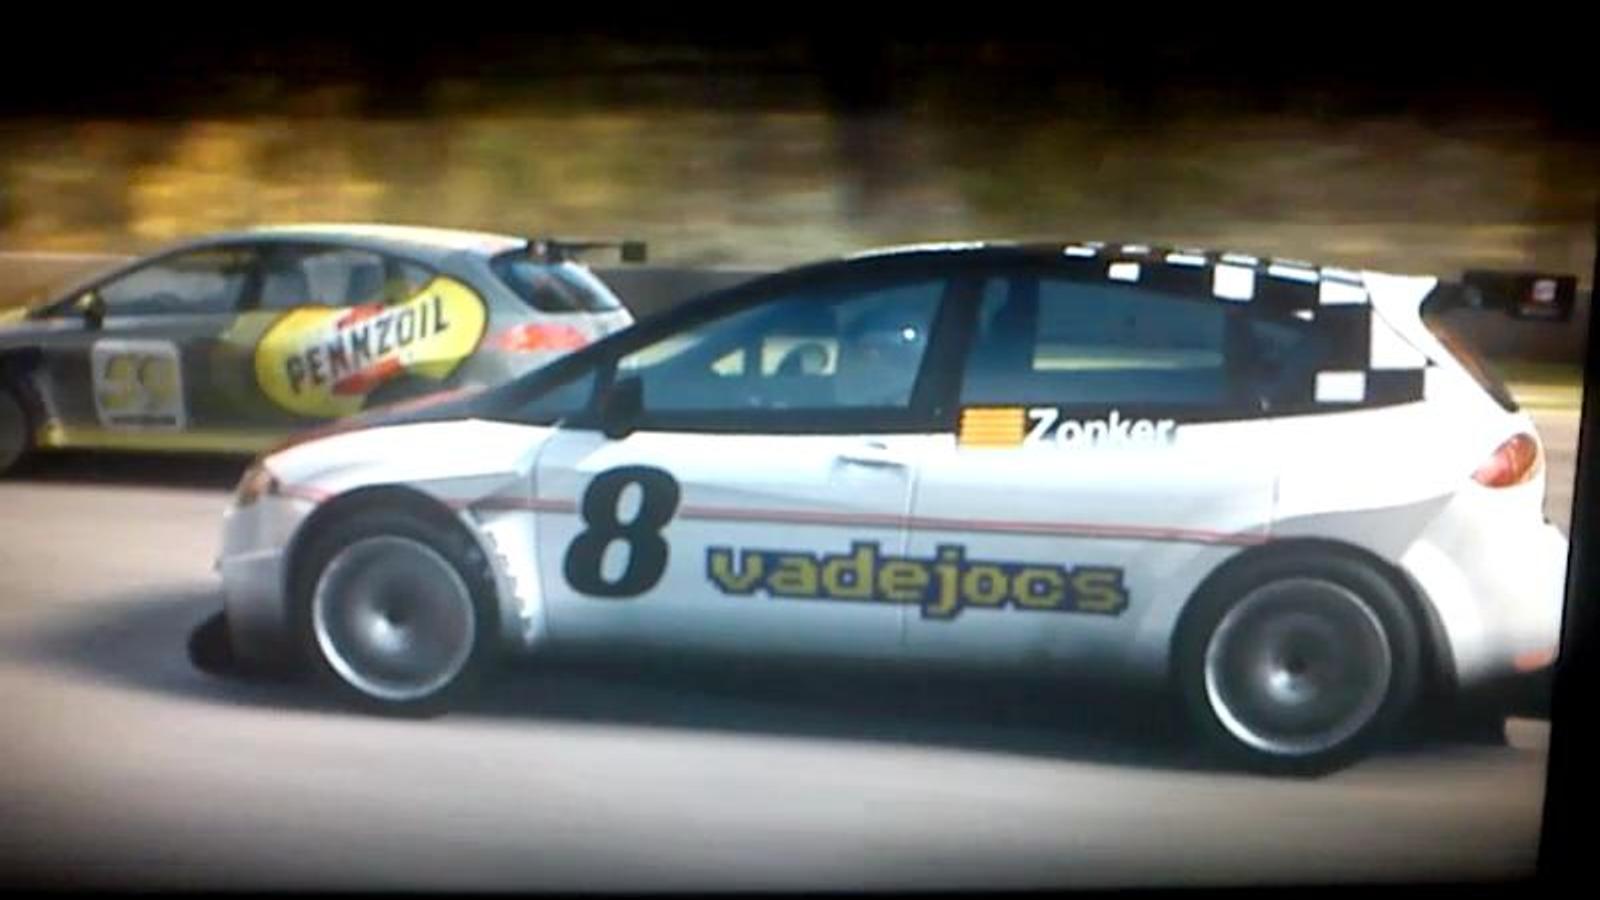 2n Campionat Forza Motorsport 3 Vadejocs - Maple Valley